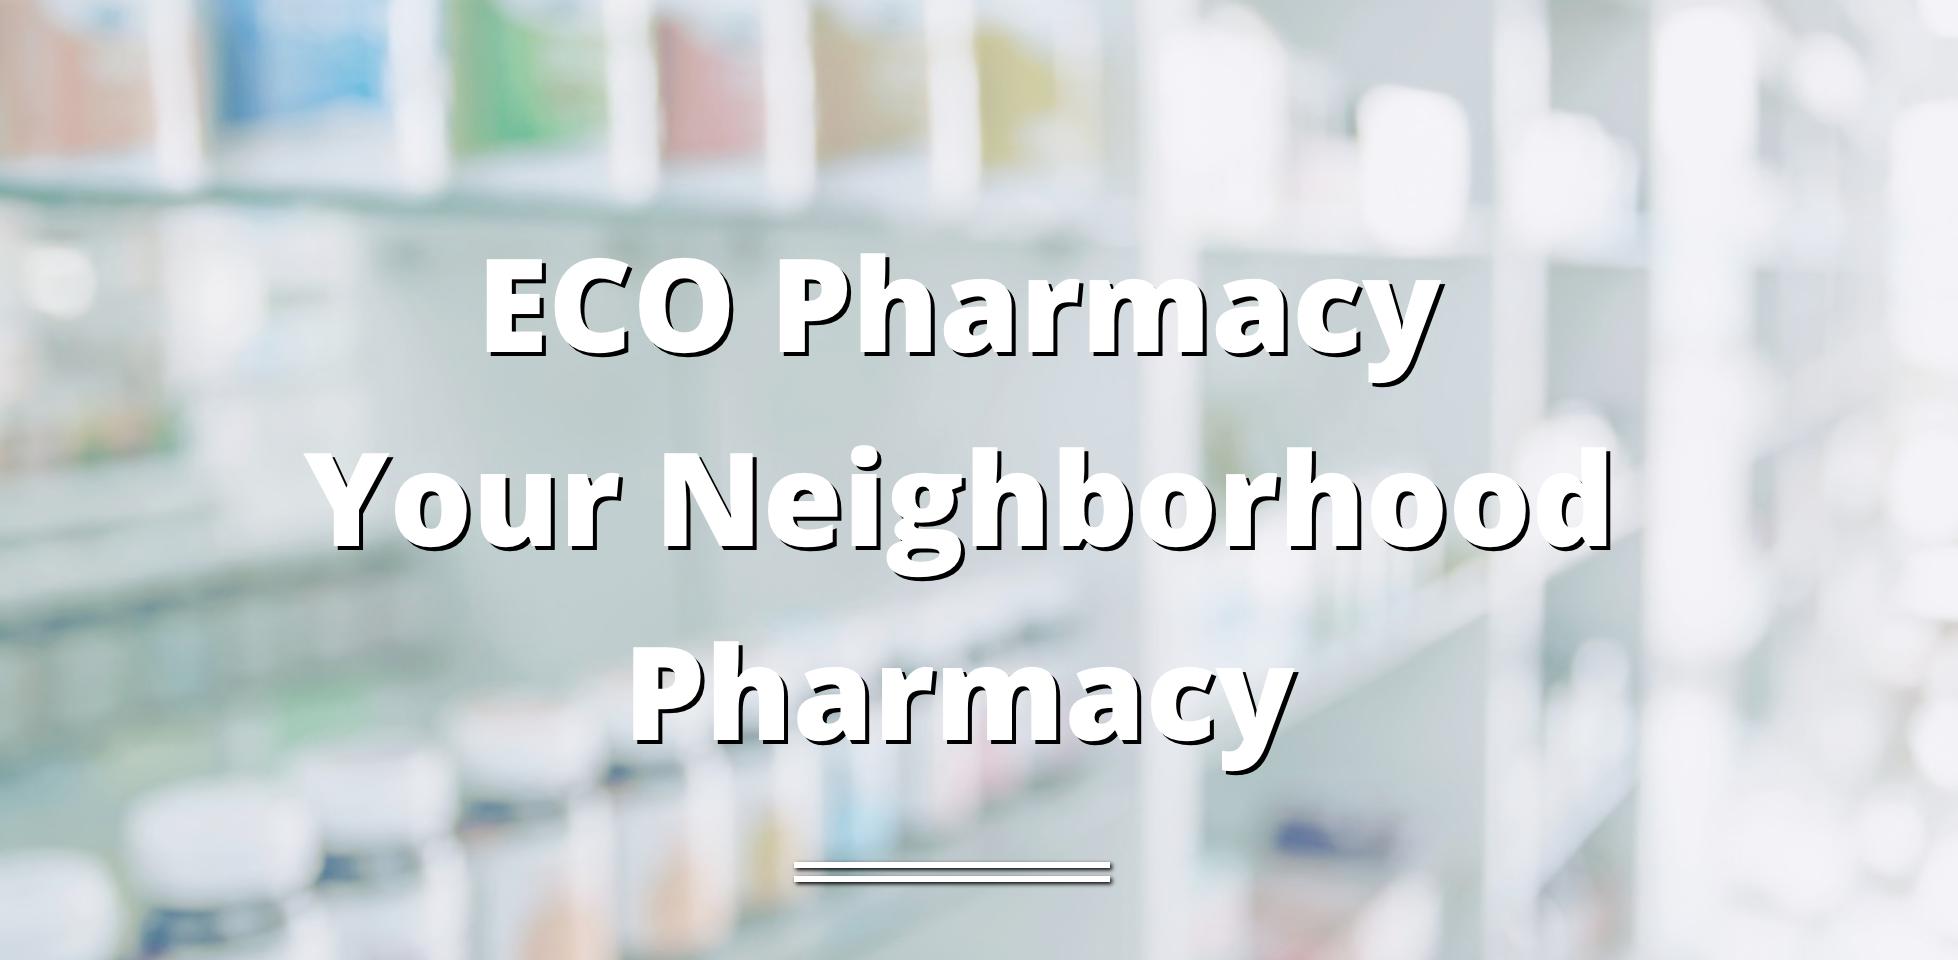 Eco Pharmacy image 1